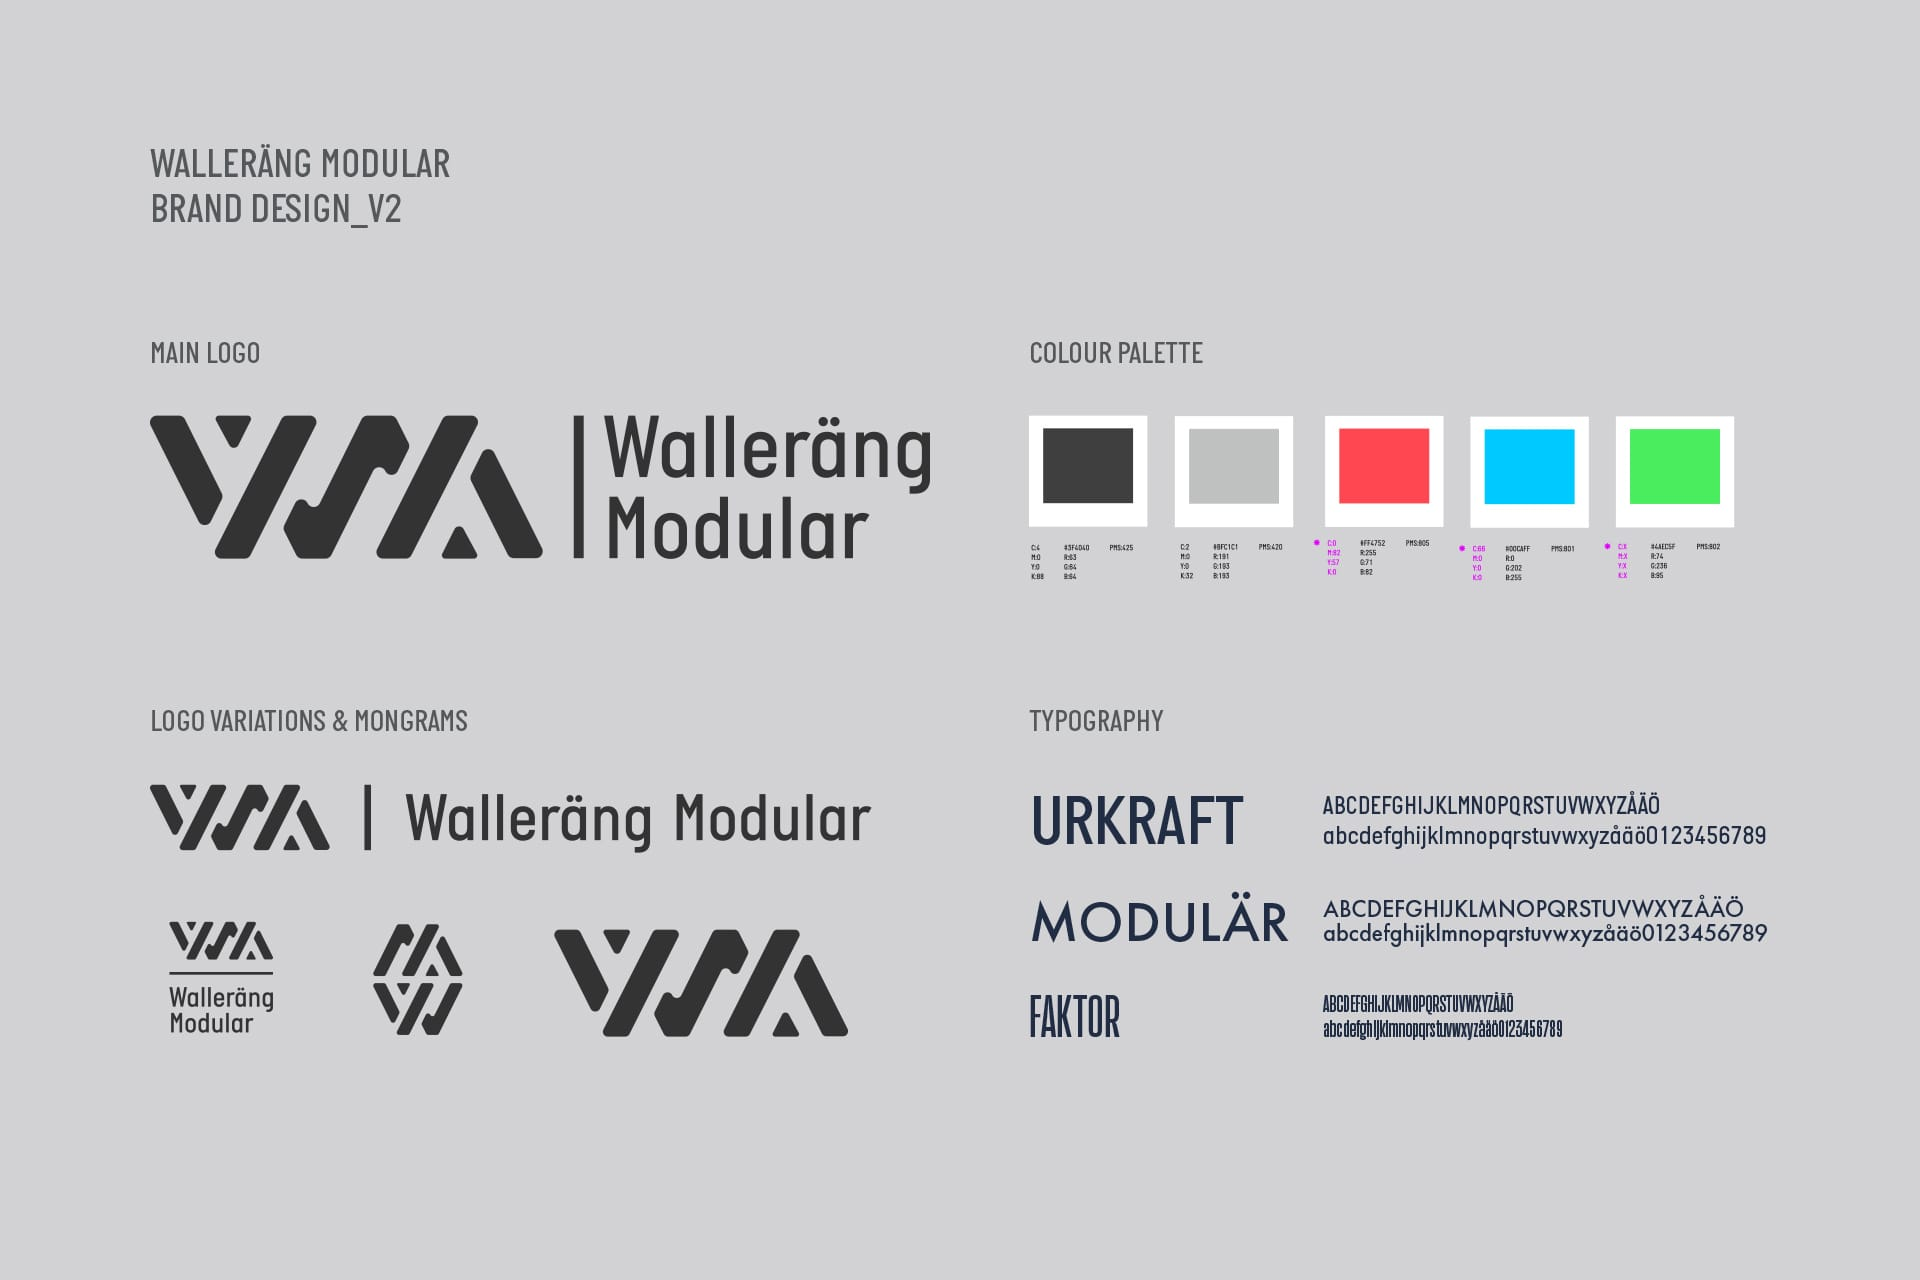 Wallerang_Modular_Identity_mnecander-2